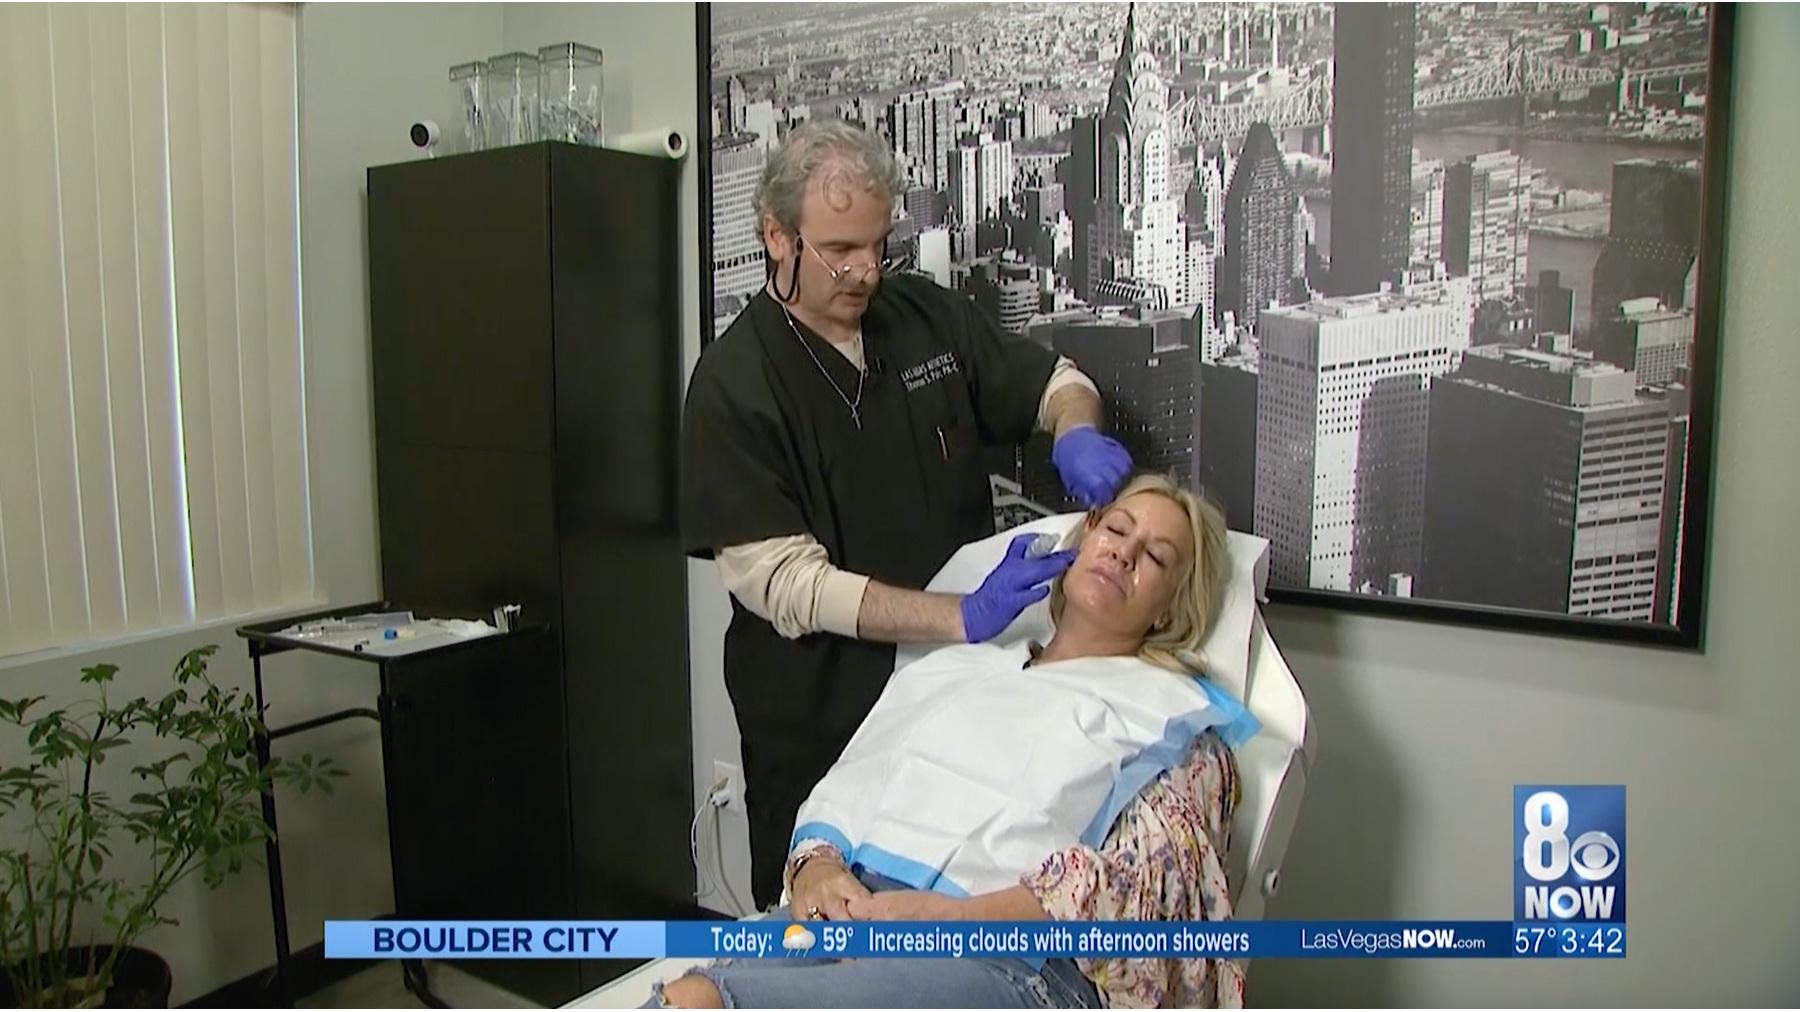 Inside the procedure room with Las Vegas AESTHETICS